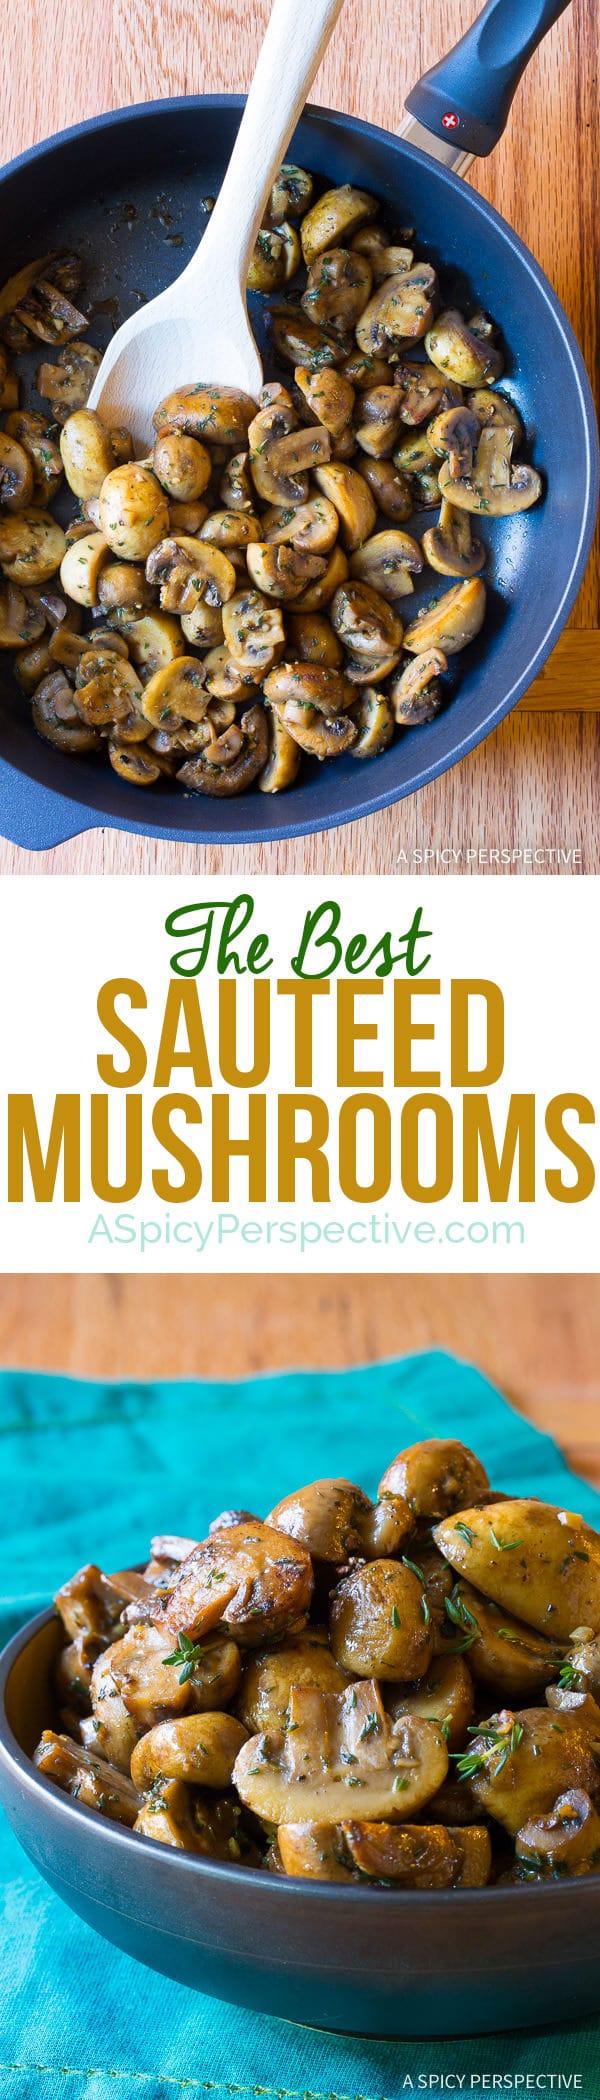 The Best Sautéed Mushrooms Recipe